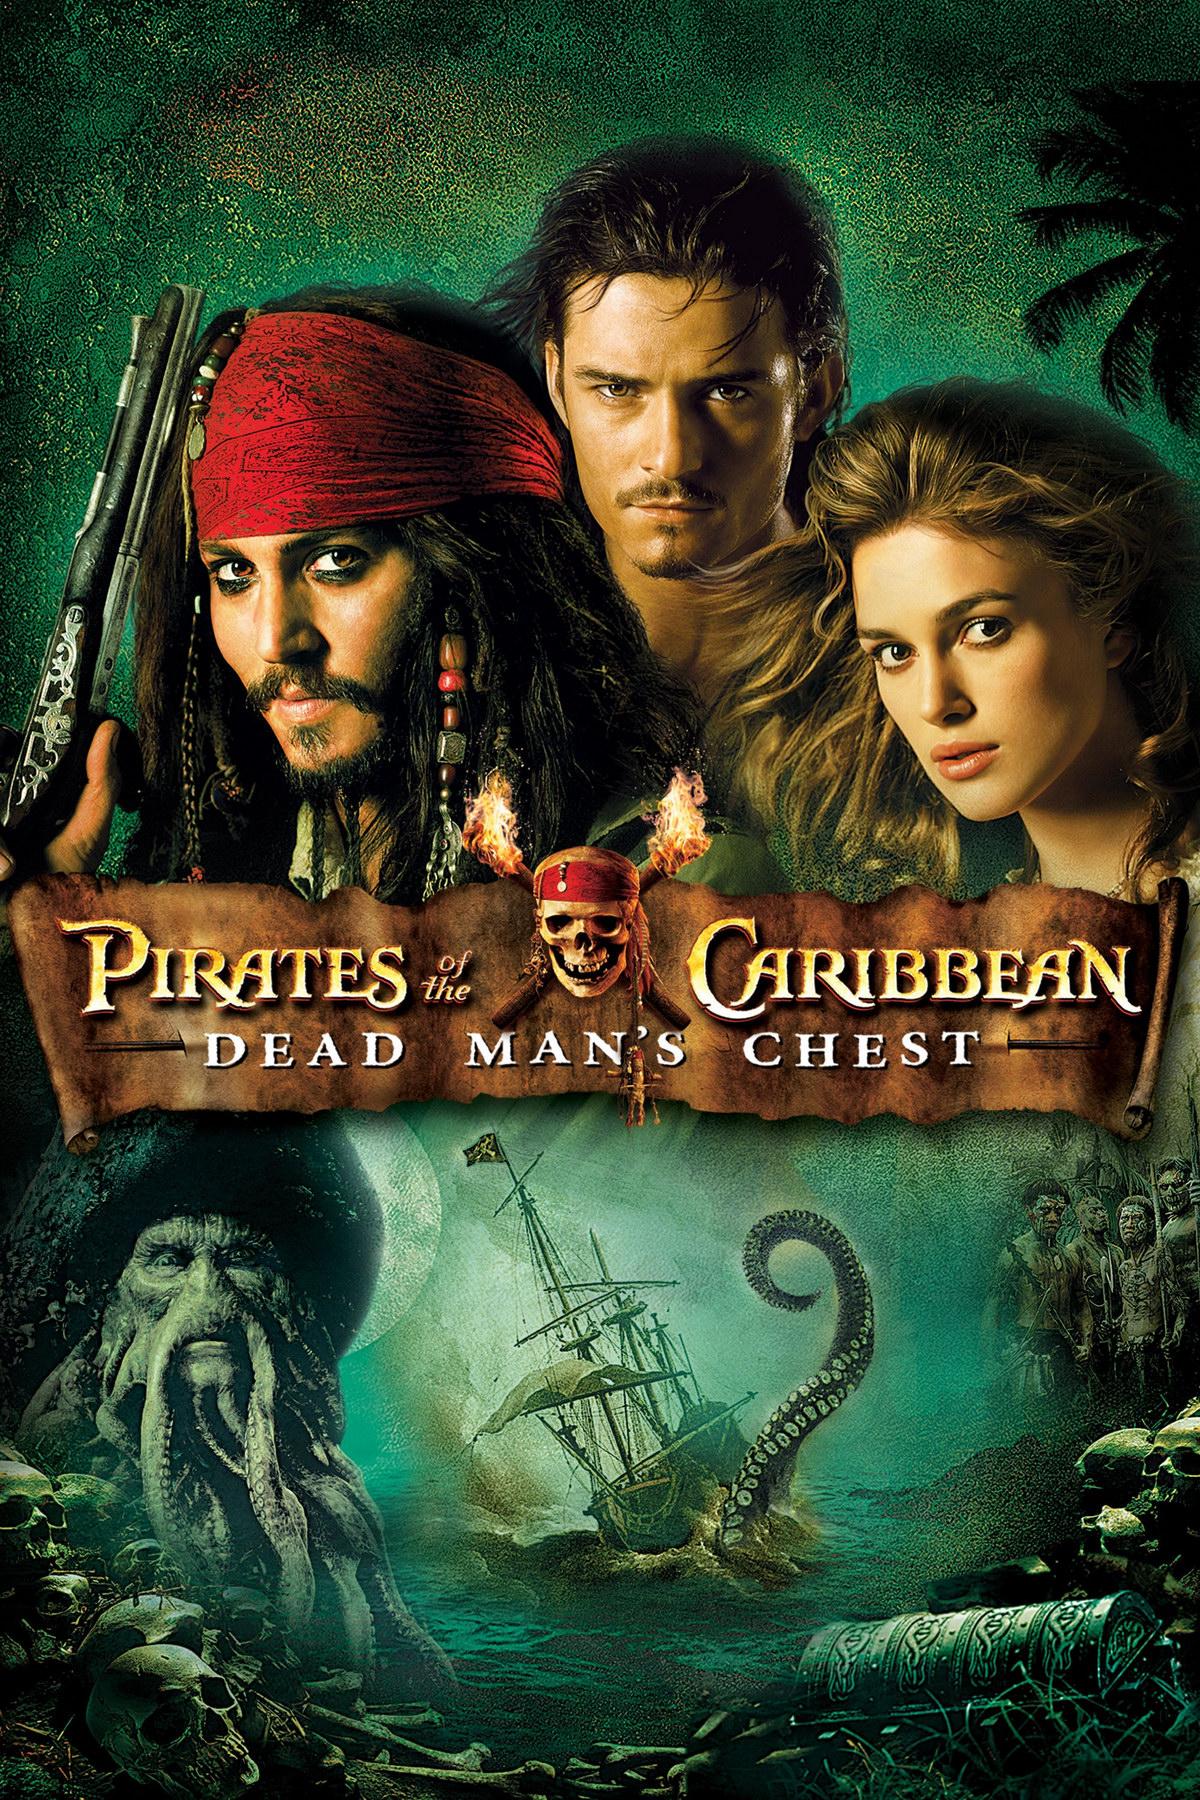 Пираты Карибского моря: Сундук Мертвеца. Обложка с сайта blu-ray.com